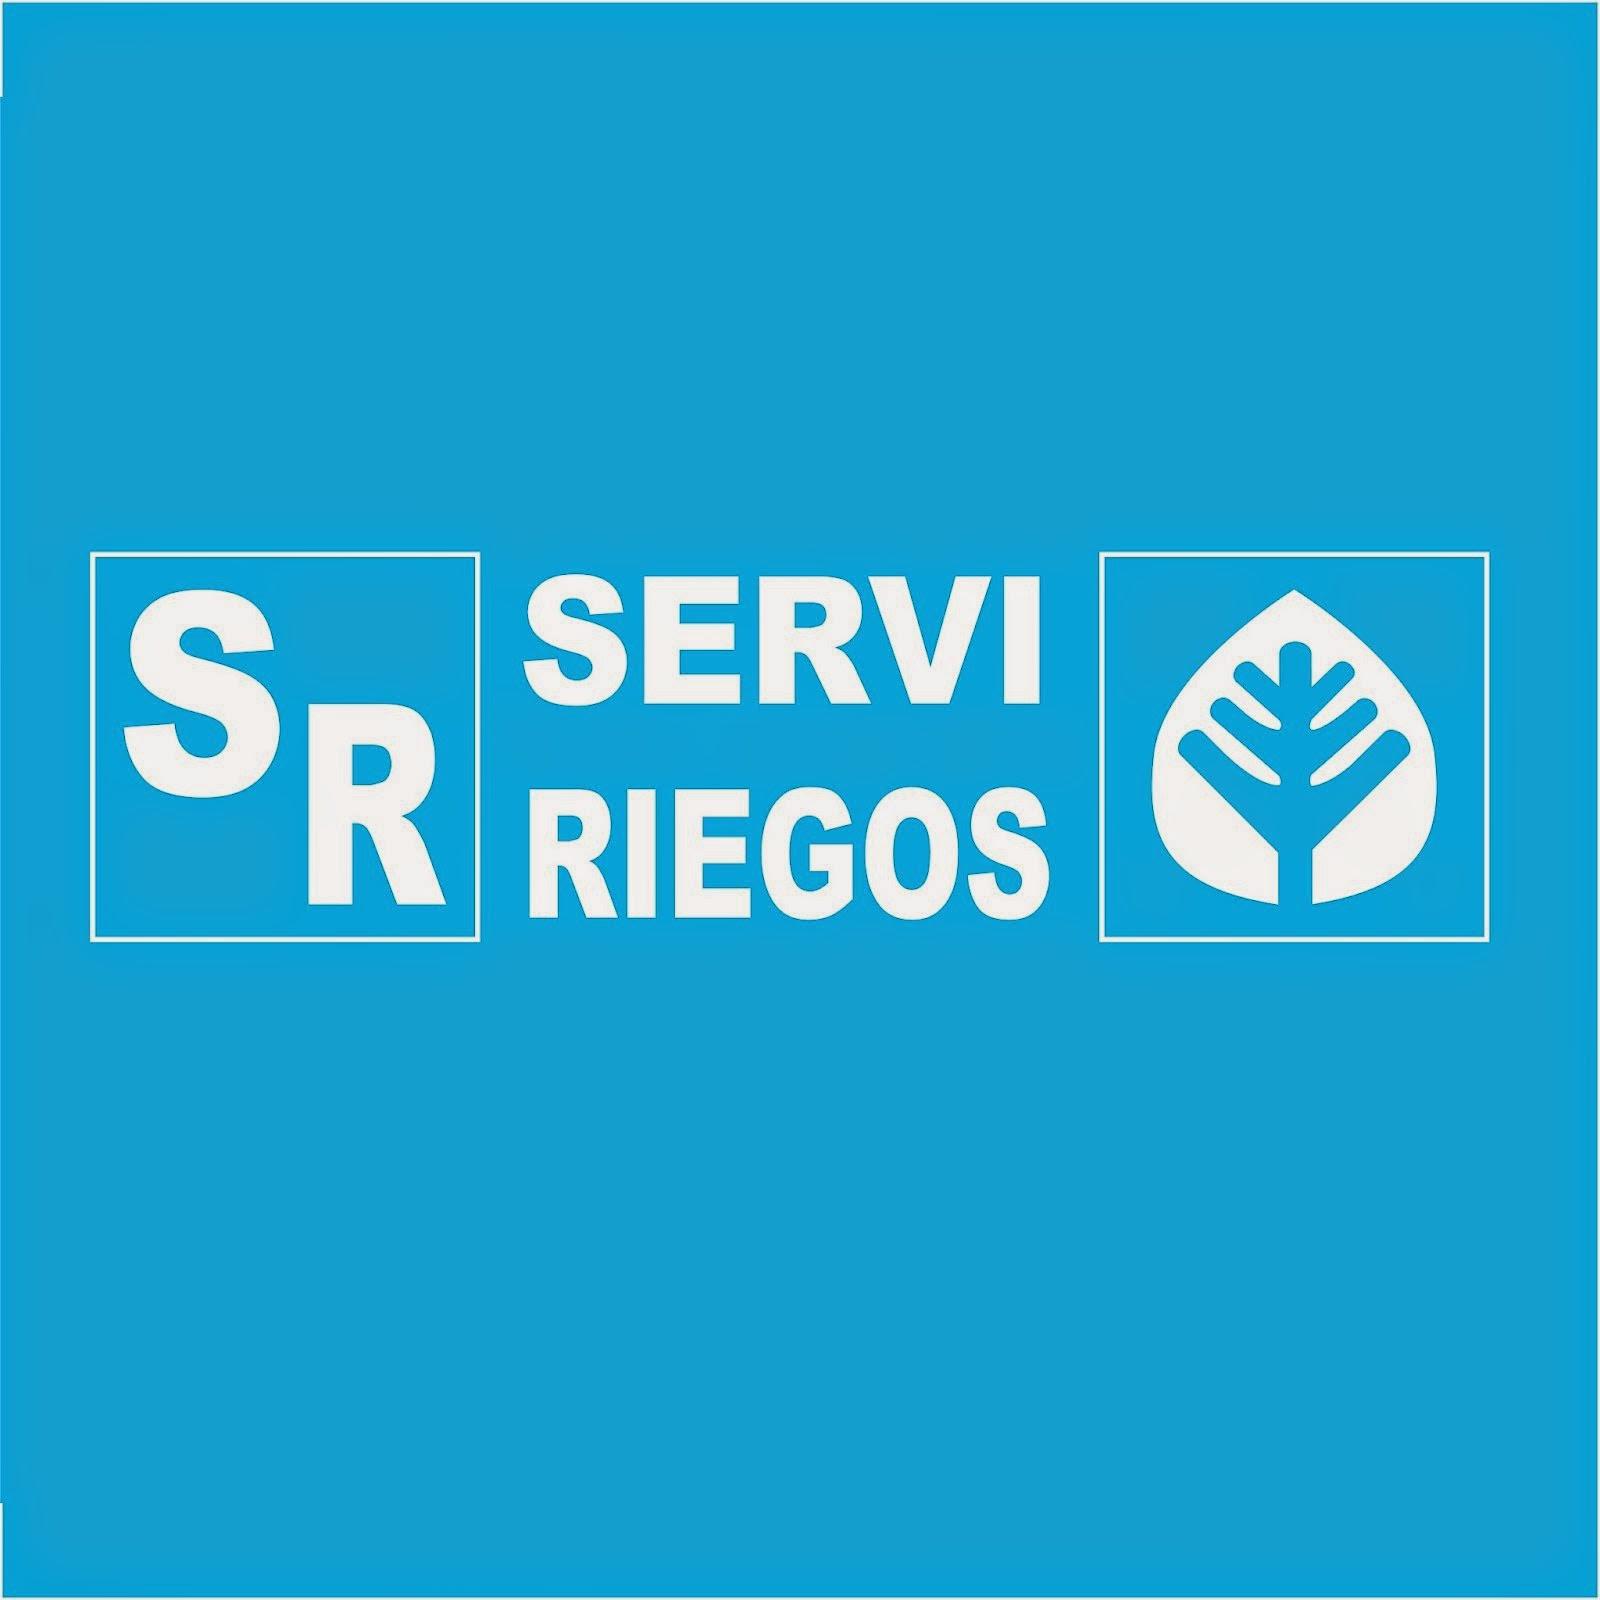 SERVI RIEGOS